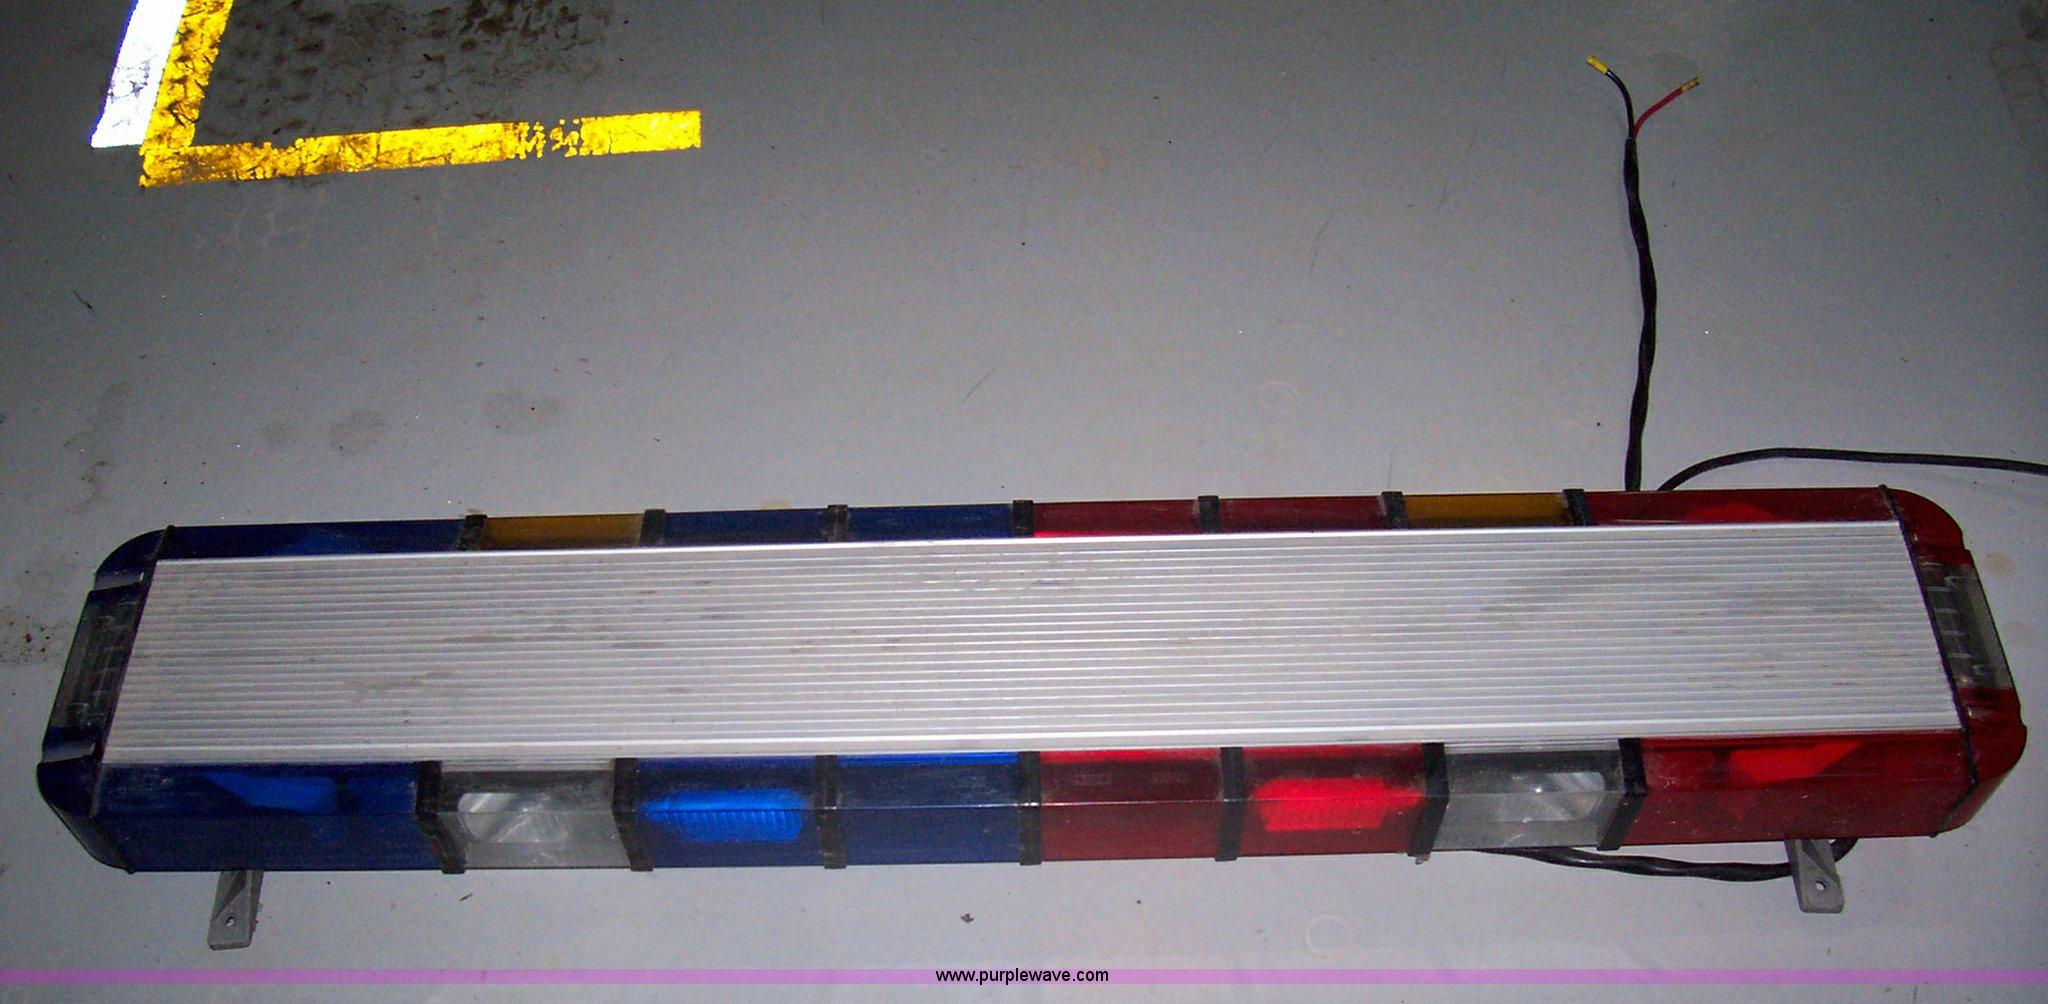 Whelen 9m strobe light bar item 8687 sold april 12 gove 8687 image for item 8687 whelen 9m strobe light bar mozeypictures Gallery